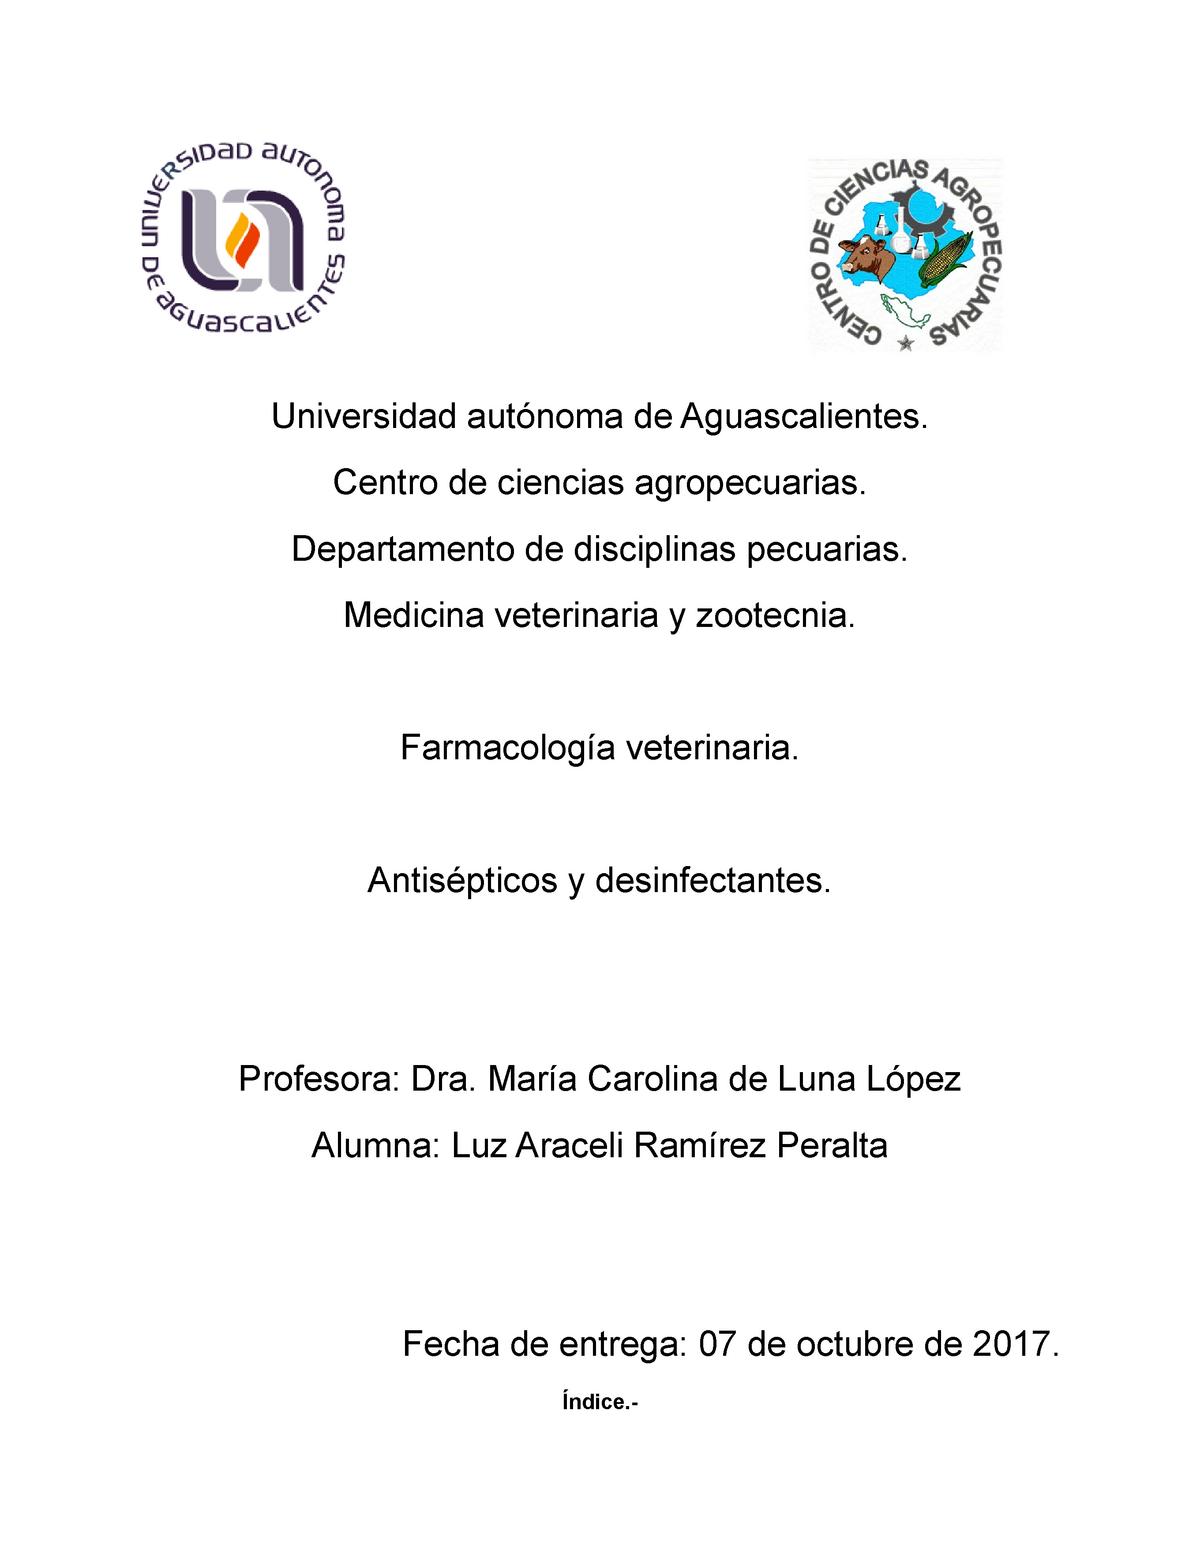 Antisépticos Y Desinfectantes Universidad De Aguascalientes Centro De Ciencias Studocu